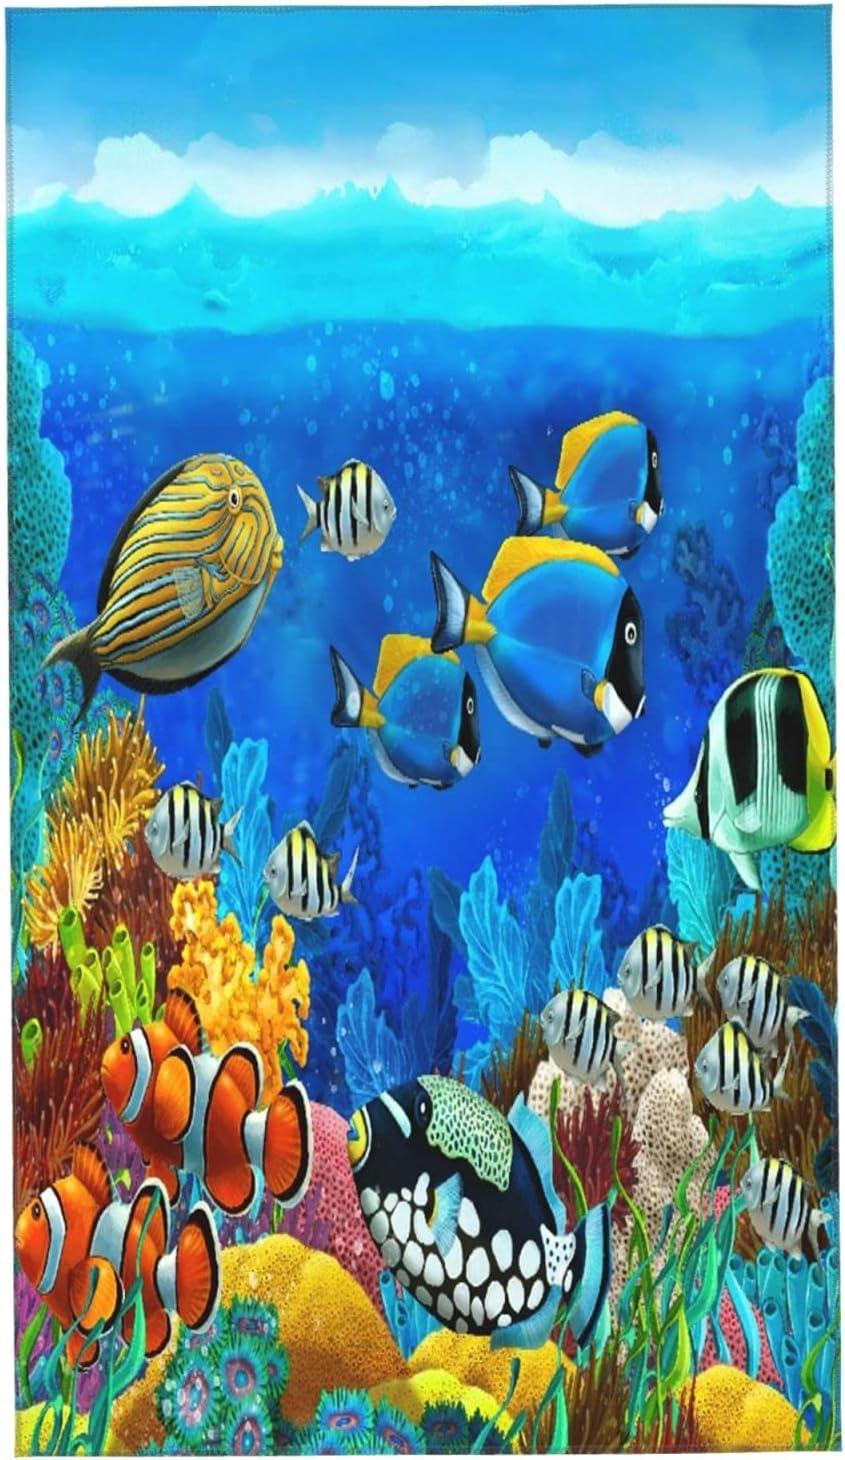 LAKUERVI Microfiber Bargain Hand Towel for Cora Sea Fish Seabed Bathroom Over item handling